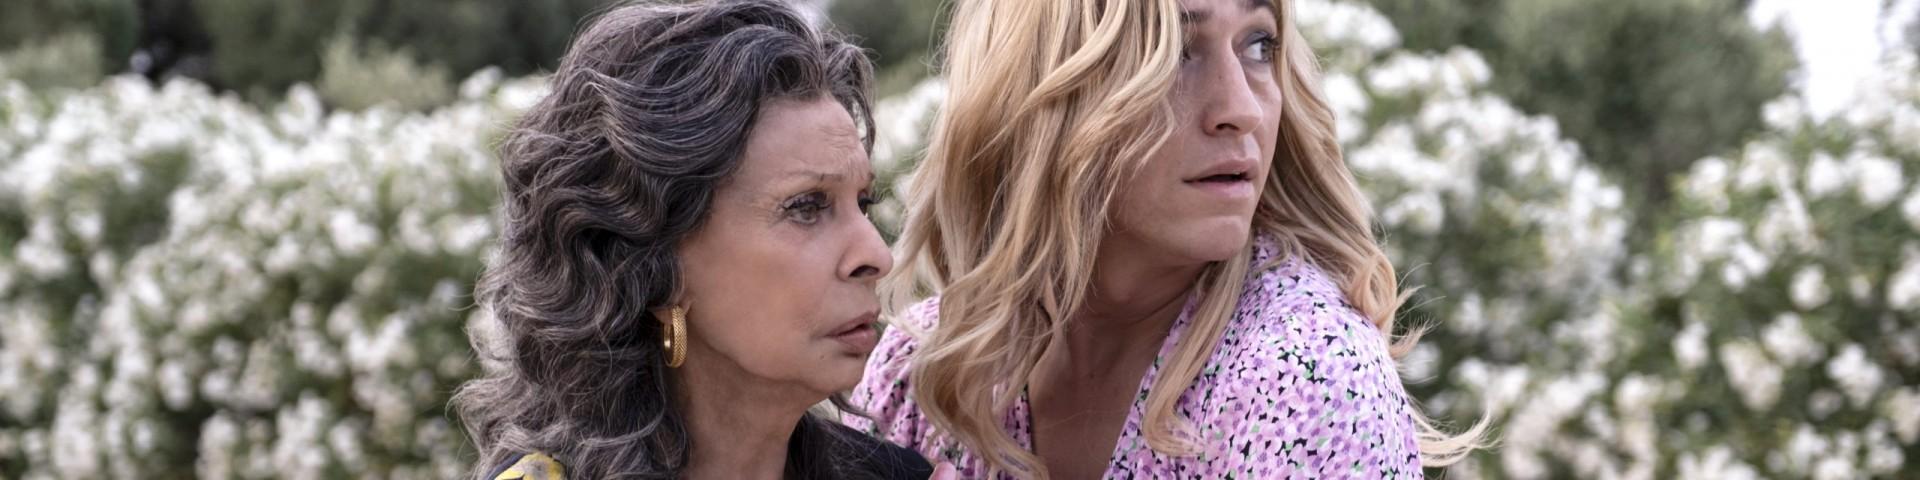 "Sophia Loren e Edoardo Ponti presentano ""La vita davanti a sé"": ""Laura Pausini è l'artista giusta"""